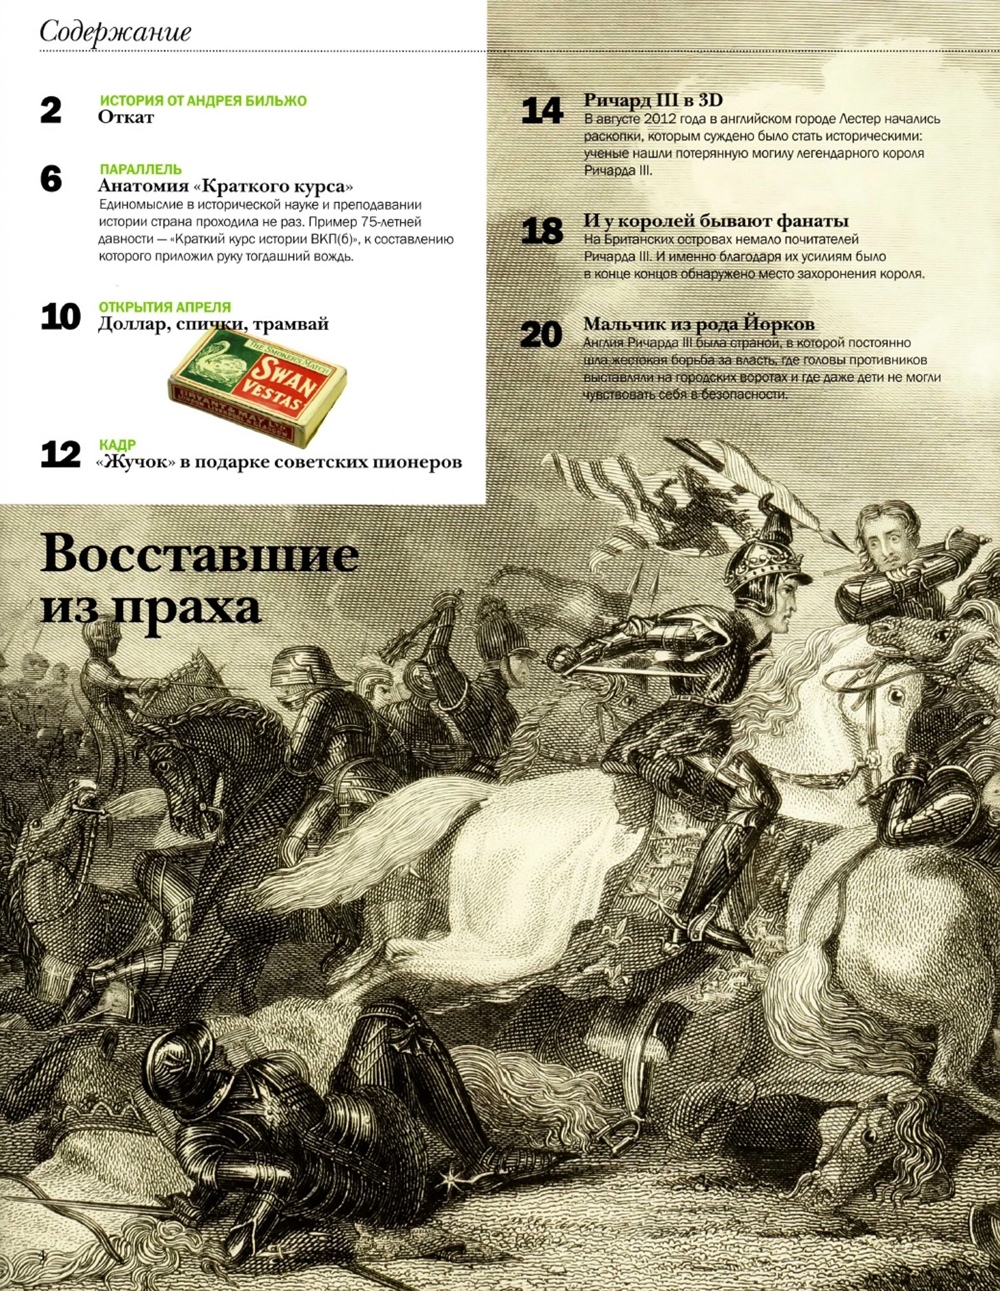 http://images.vfl.ru/ii/1404418798/ddd49a38/5616490.jpg